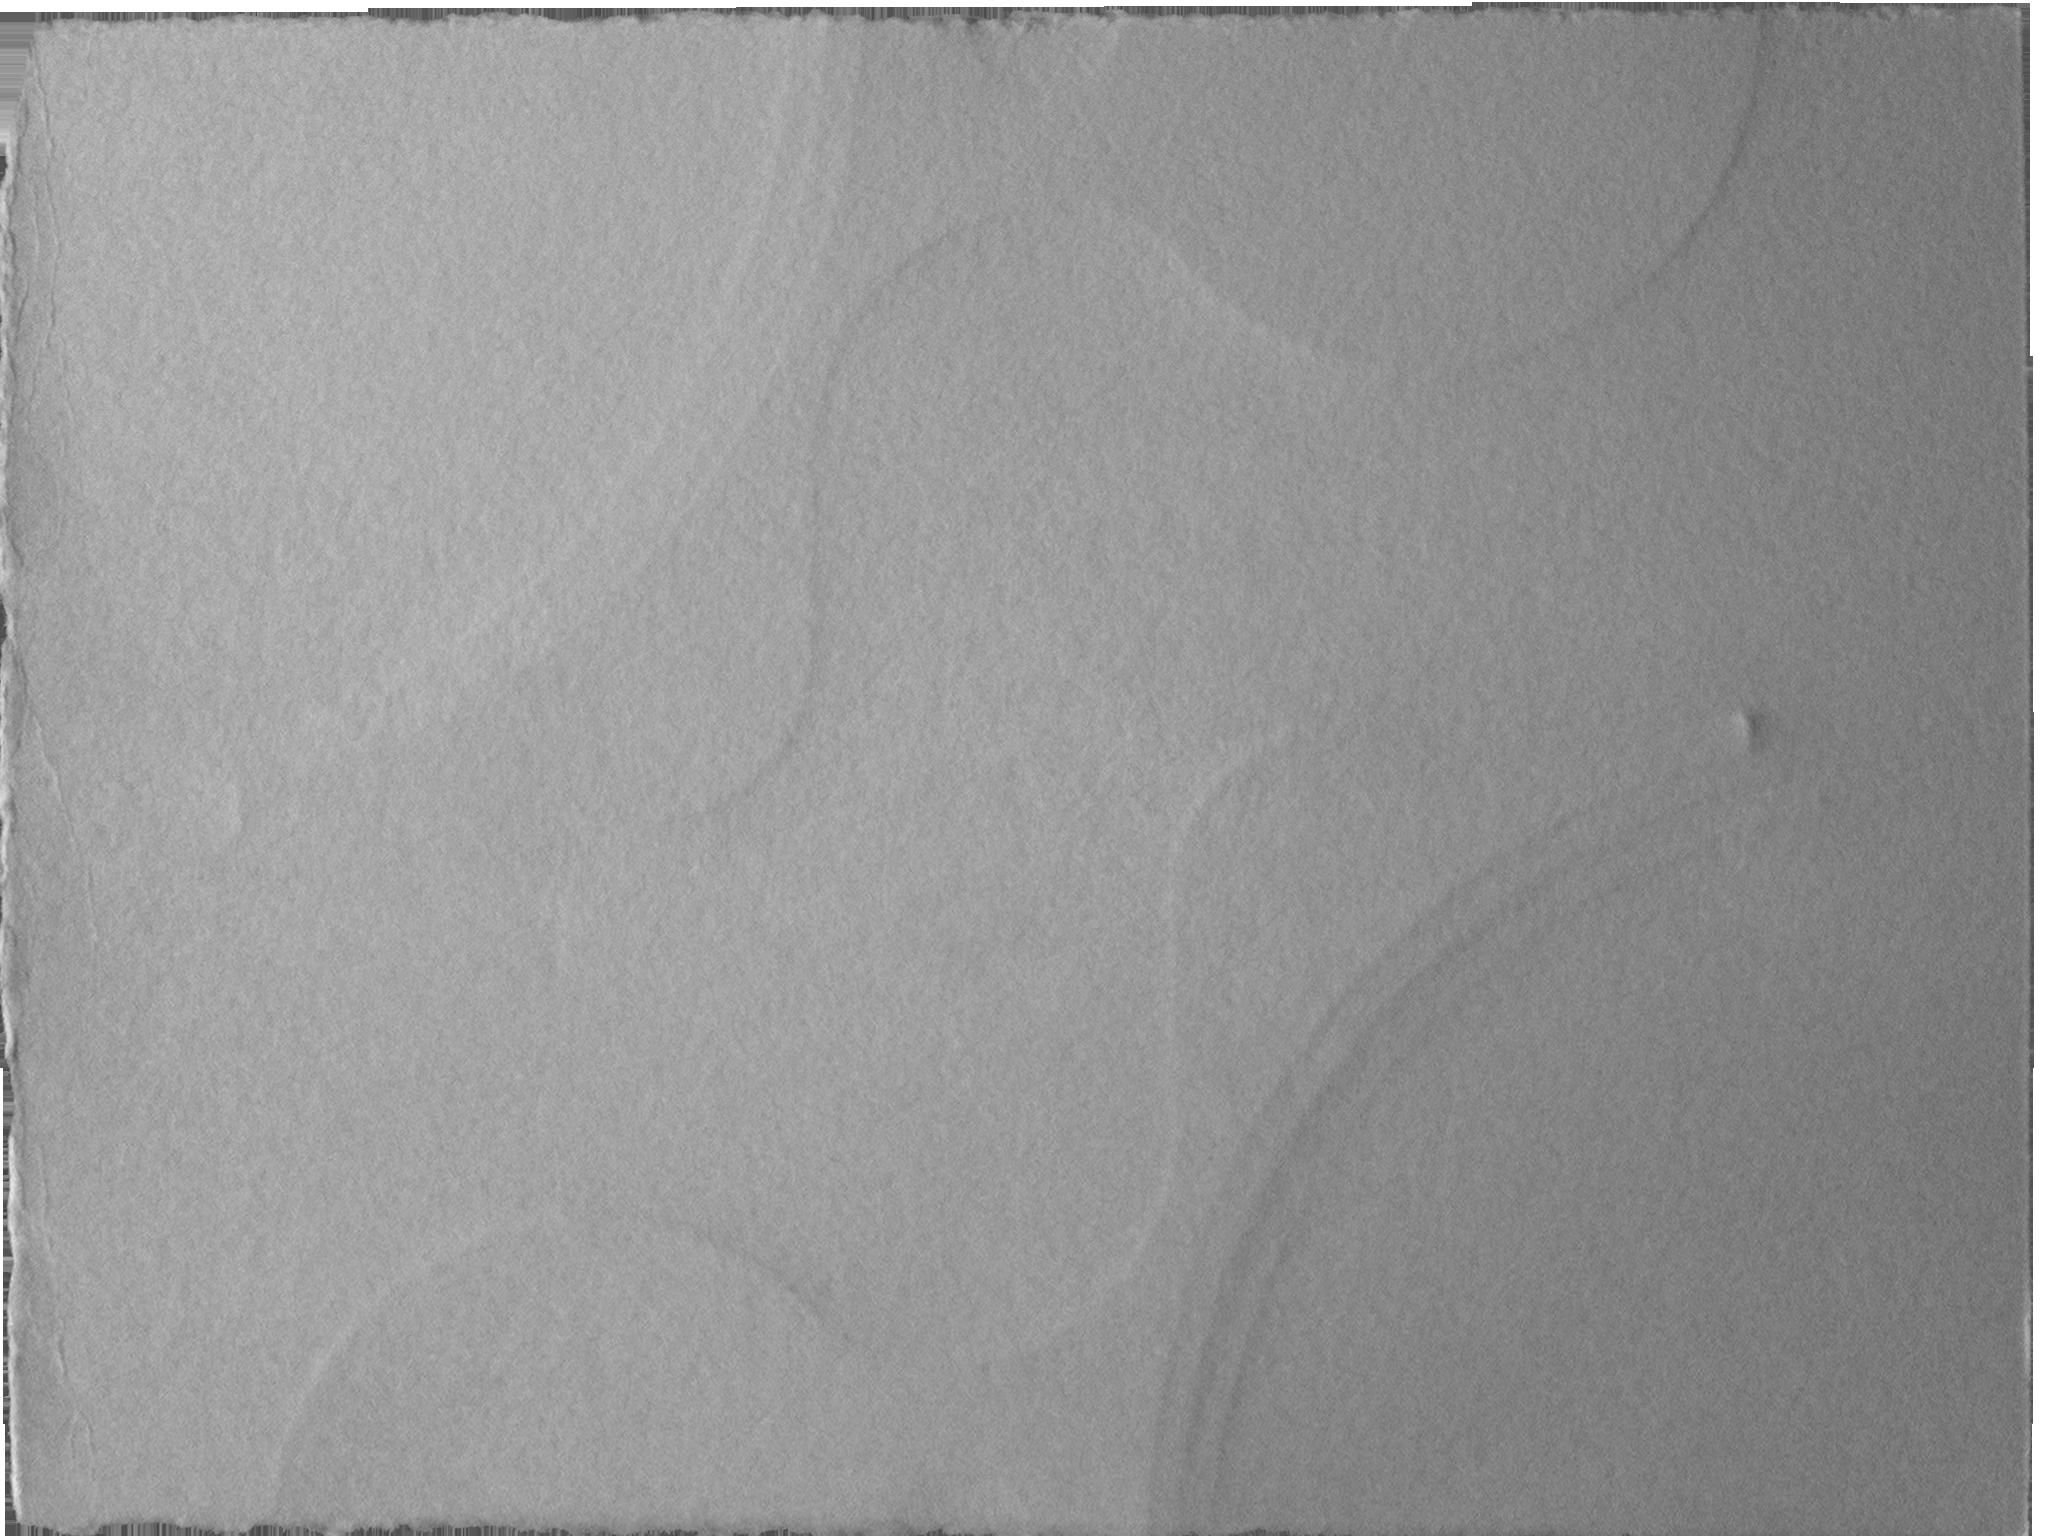 paper, 2013